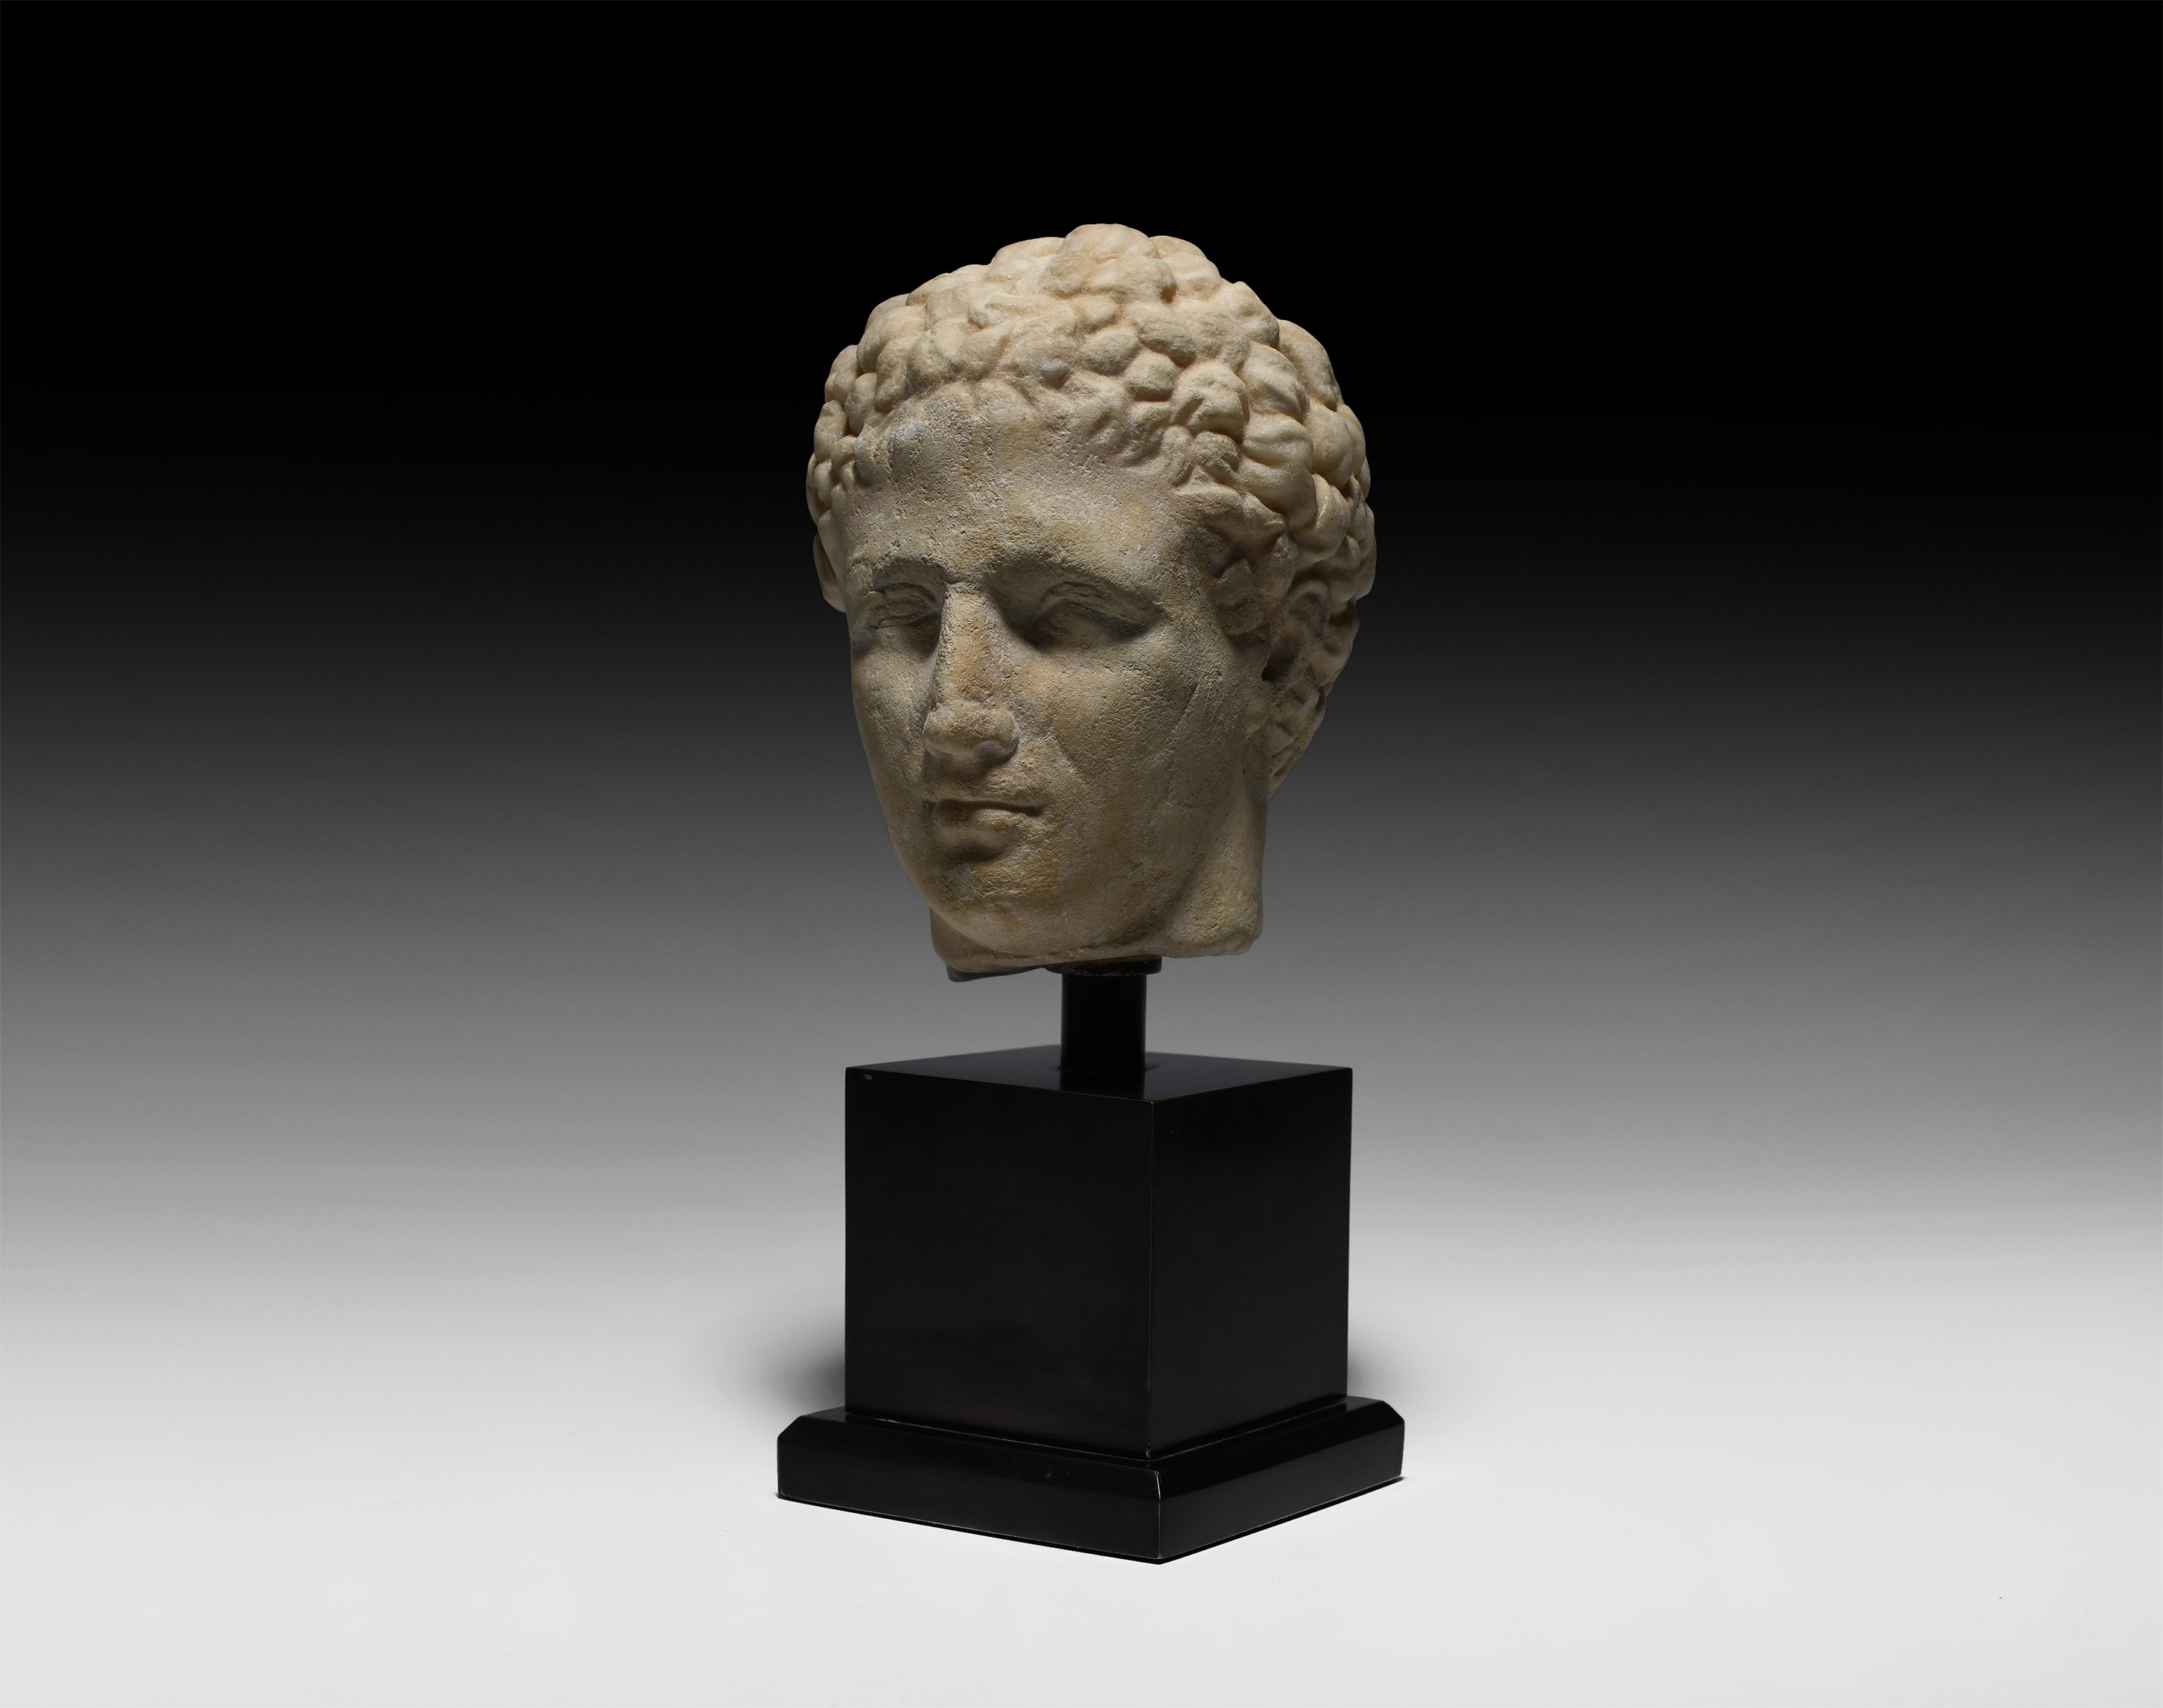 Roman Marble Head of a Man